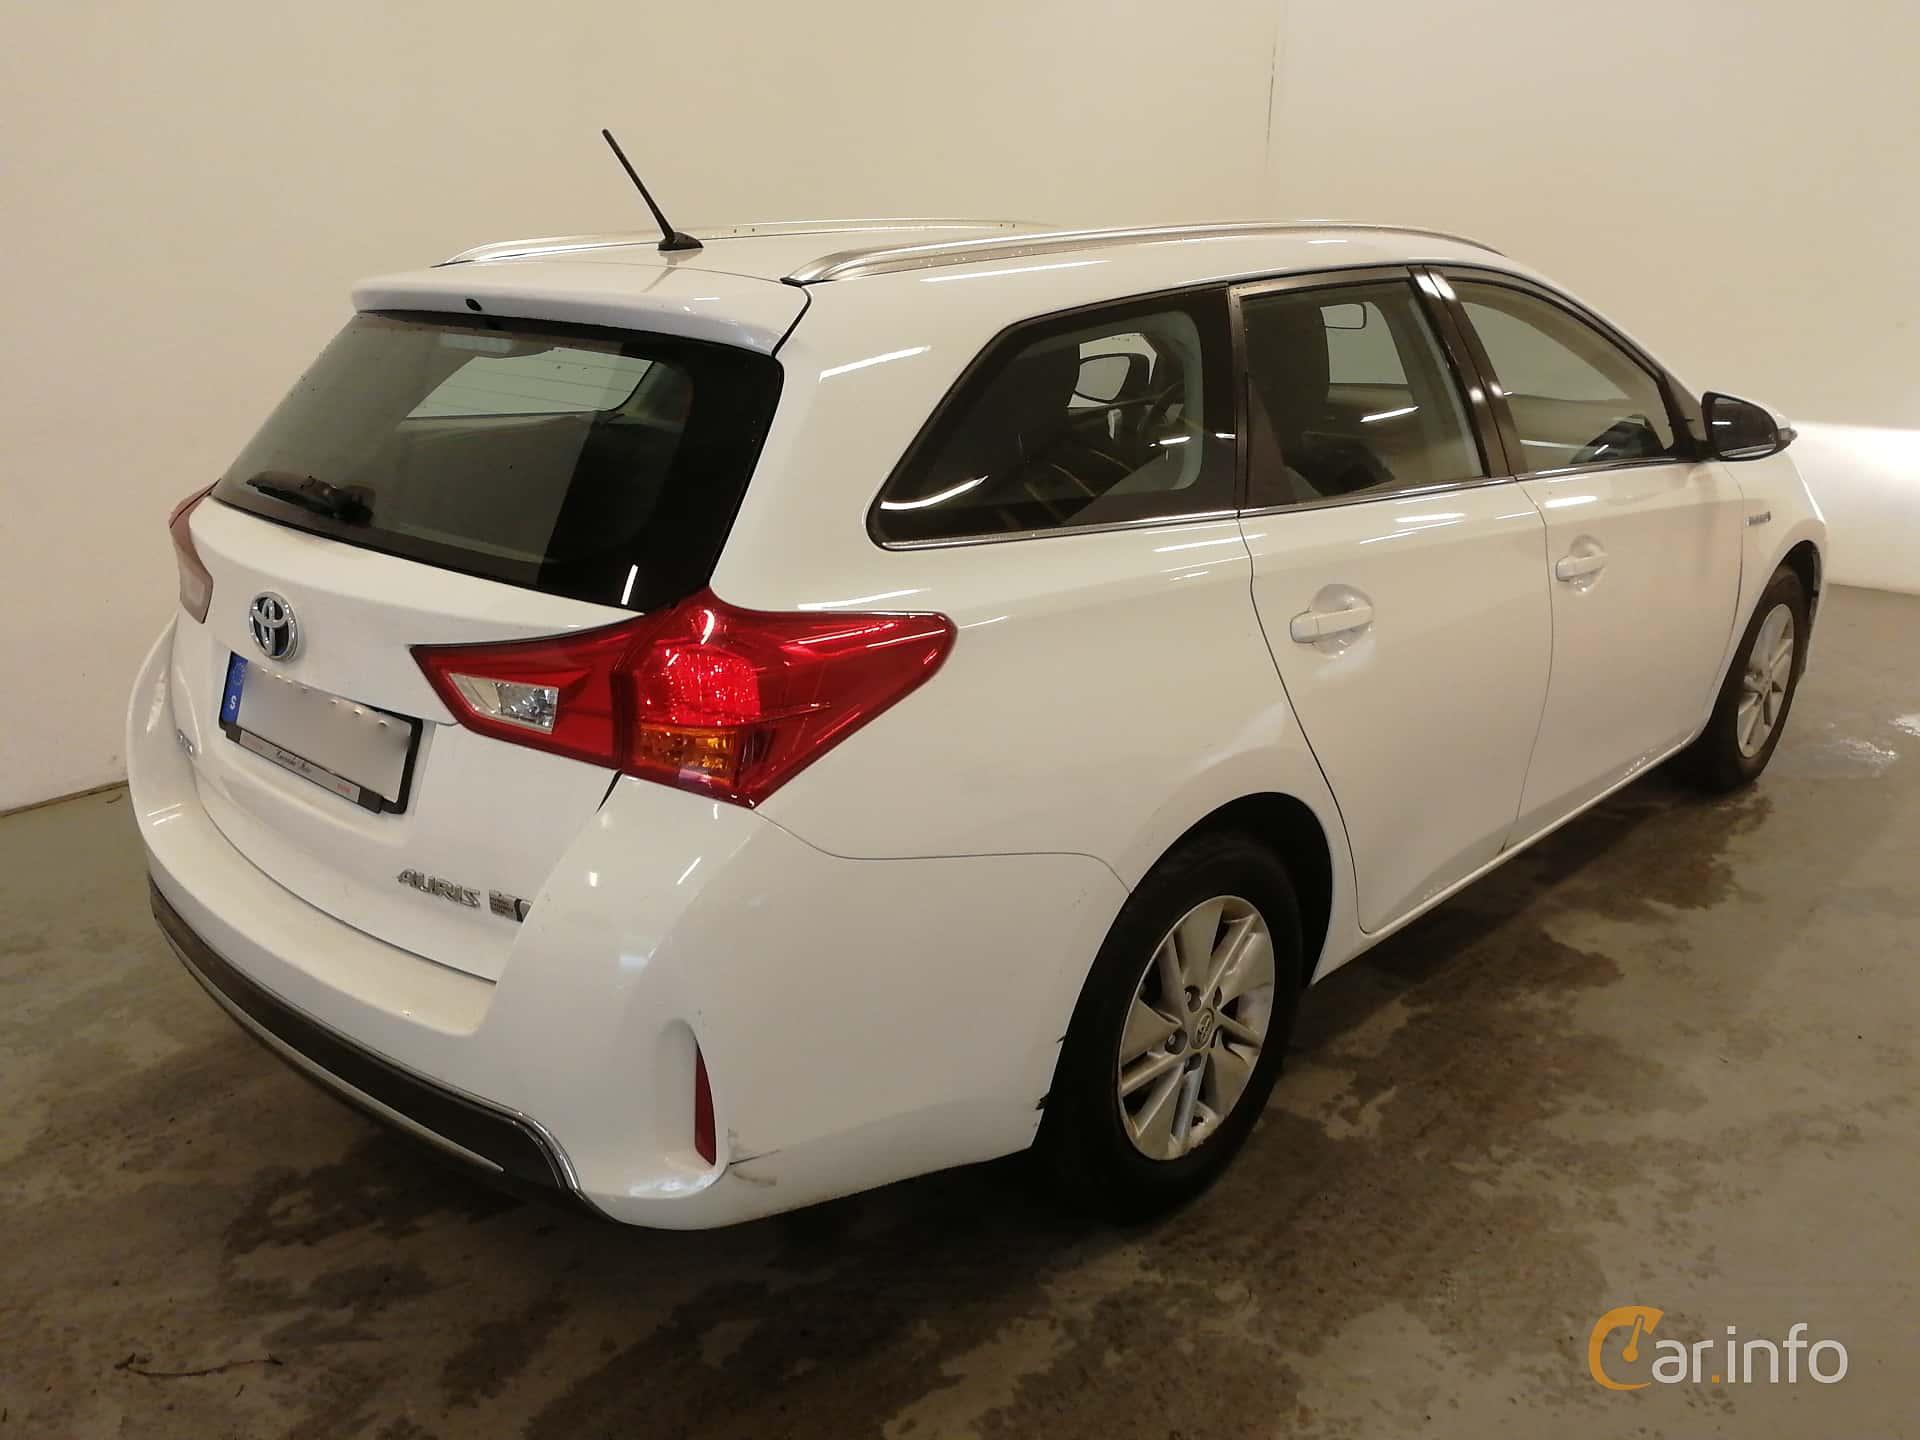 Toyota Auris Touring Sports Hybrid 1.8 VVT-i + 3JM CVT, 136hp, 2015